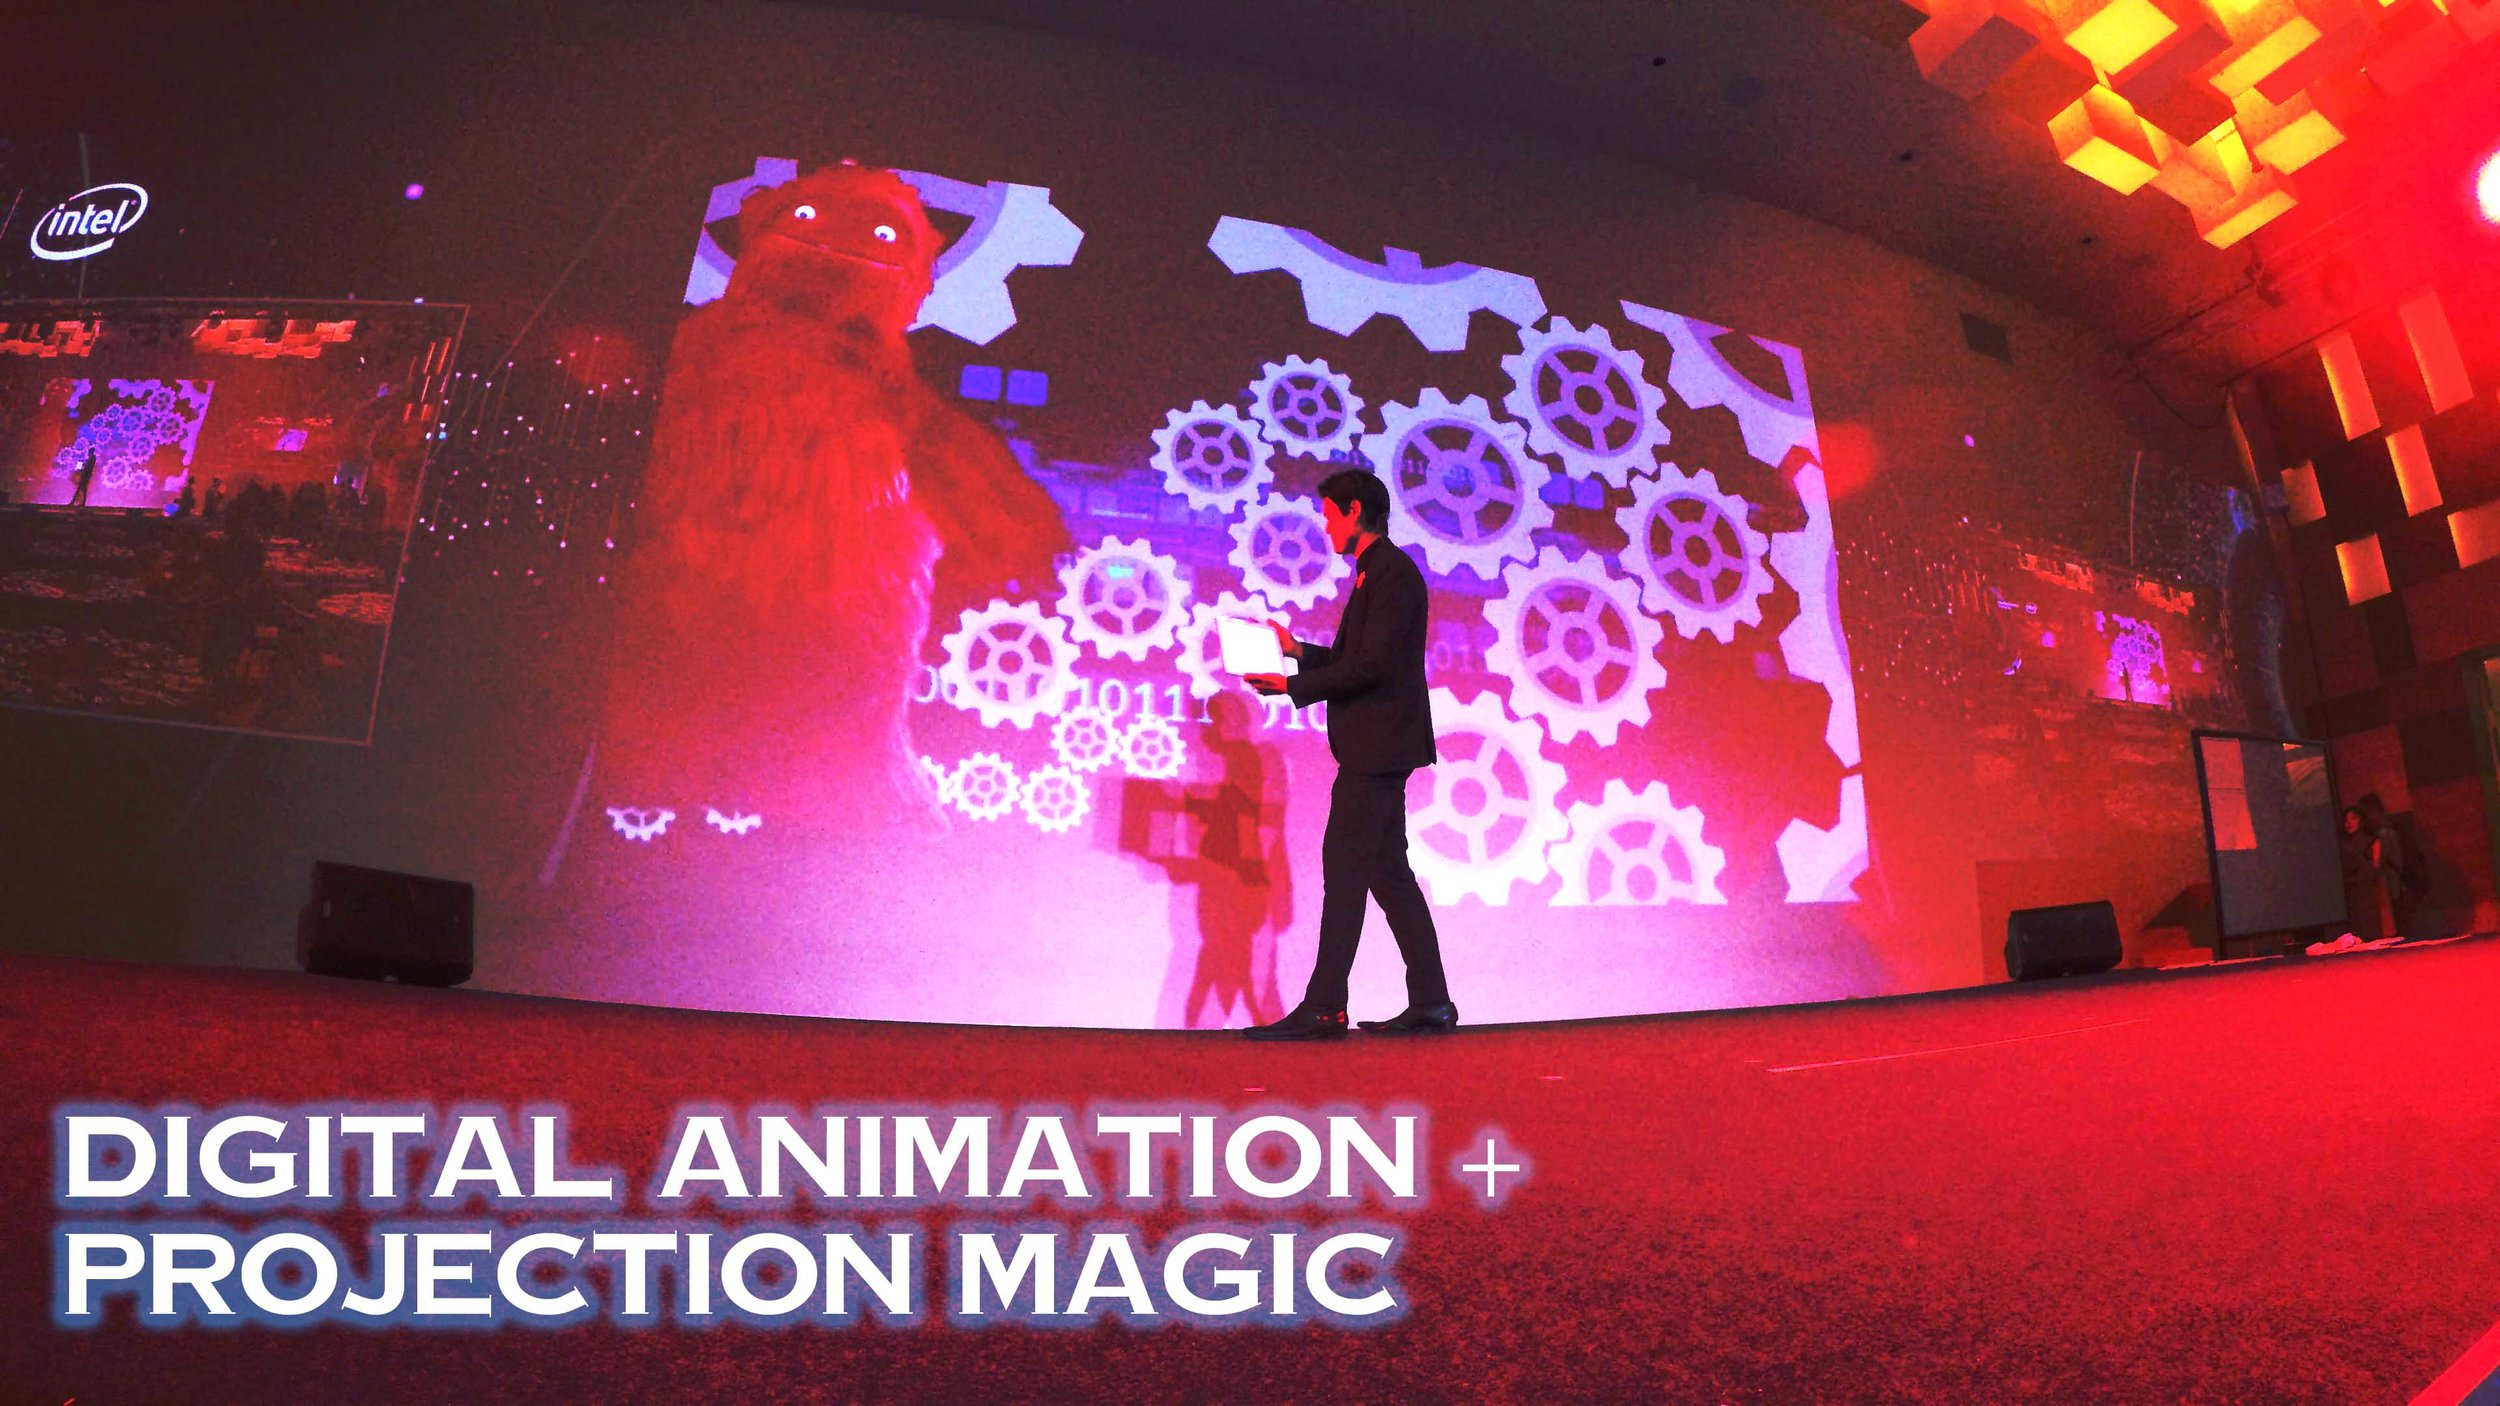 led wall magic show HPE